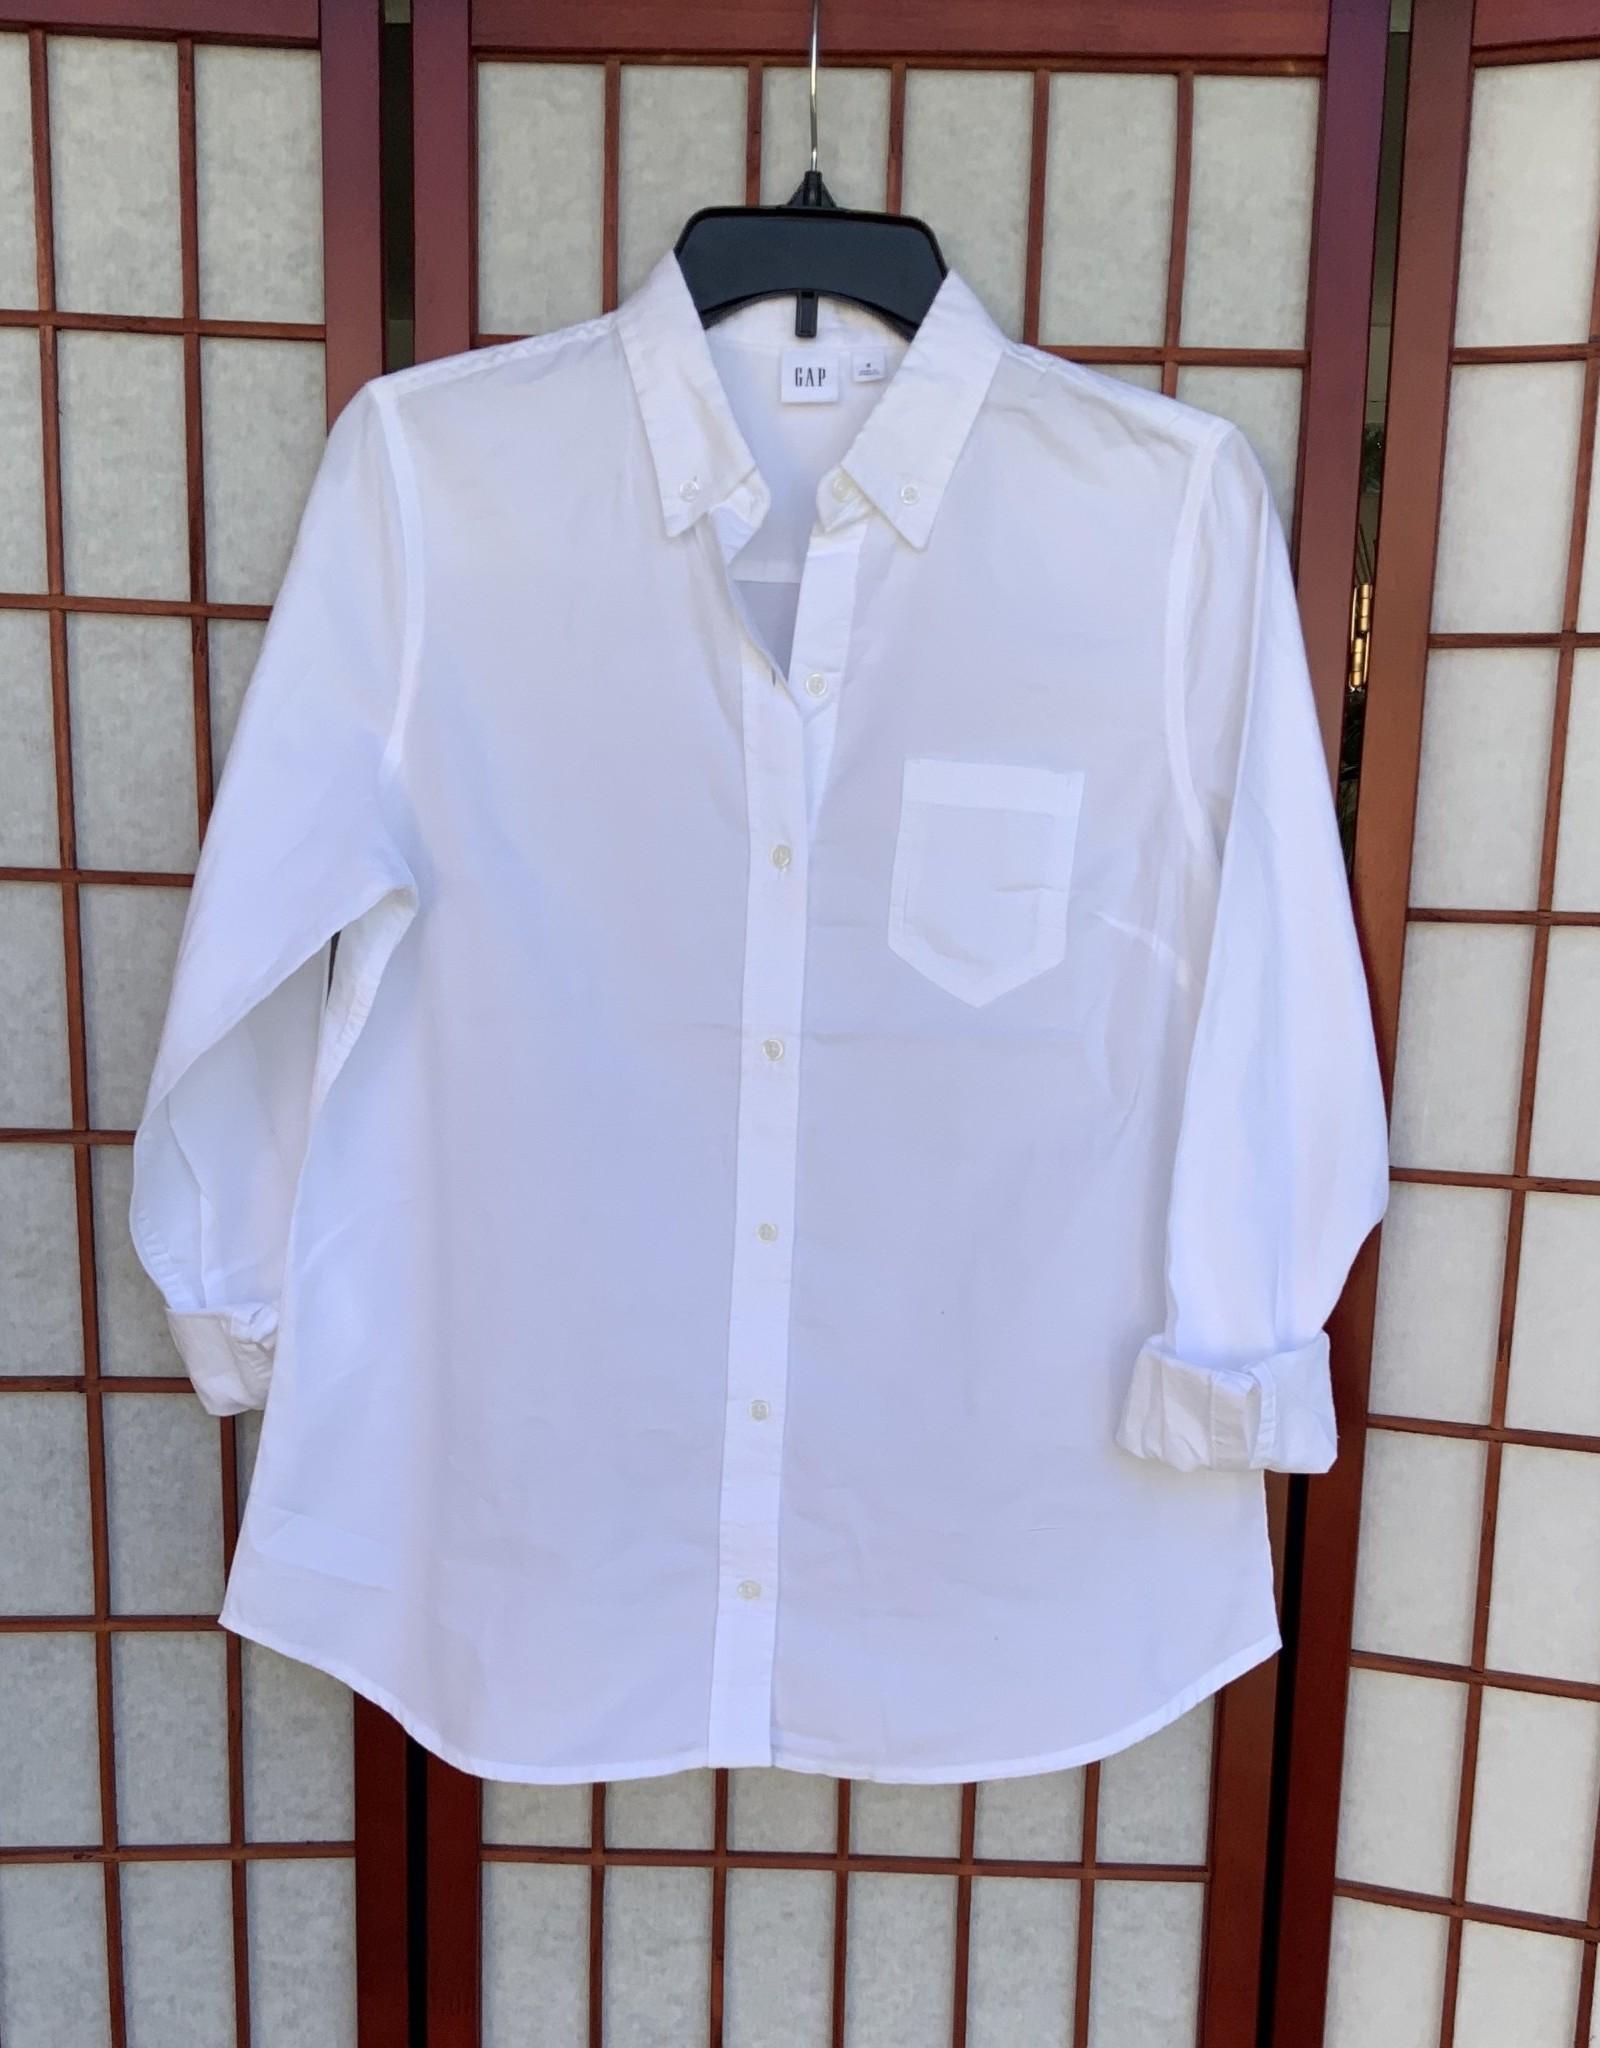 Gap Gap Fitted Boyfriend Long Sleeve Shirt